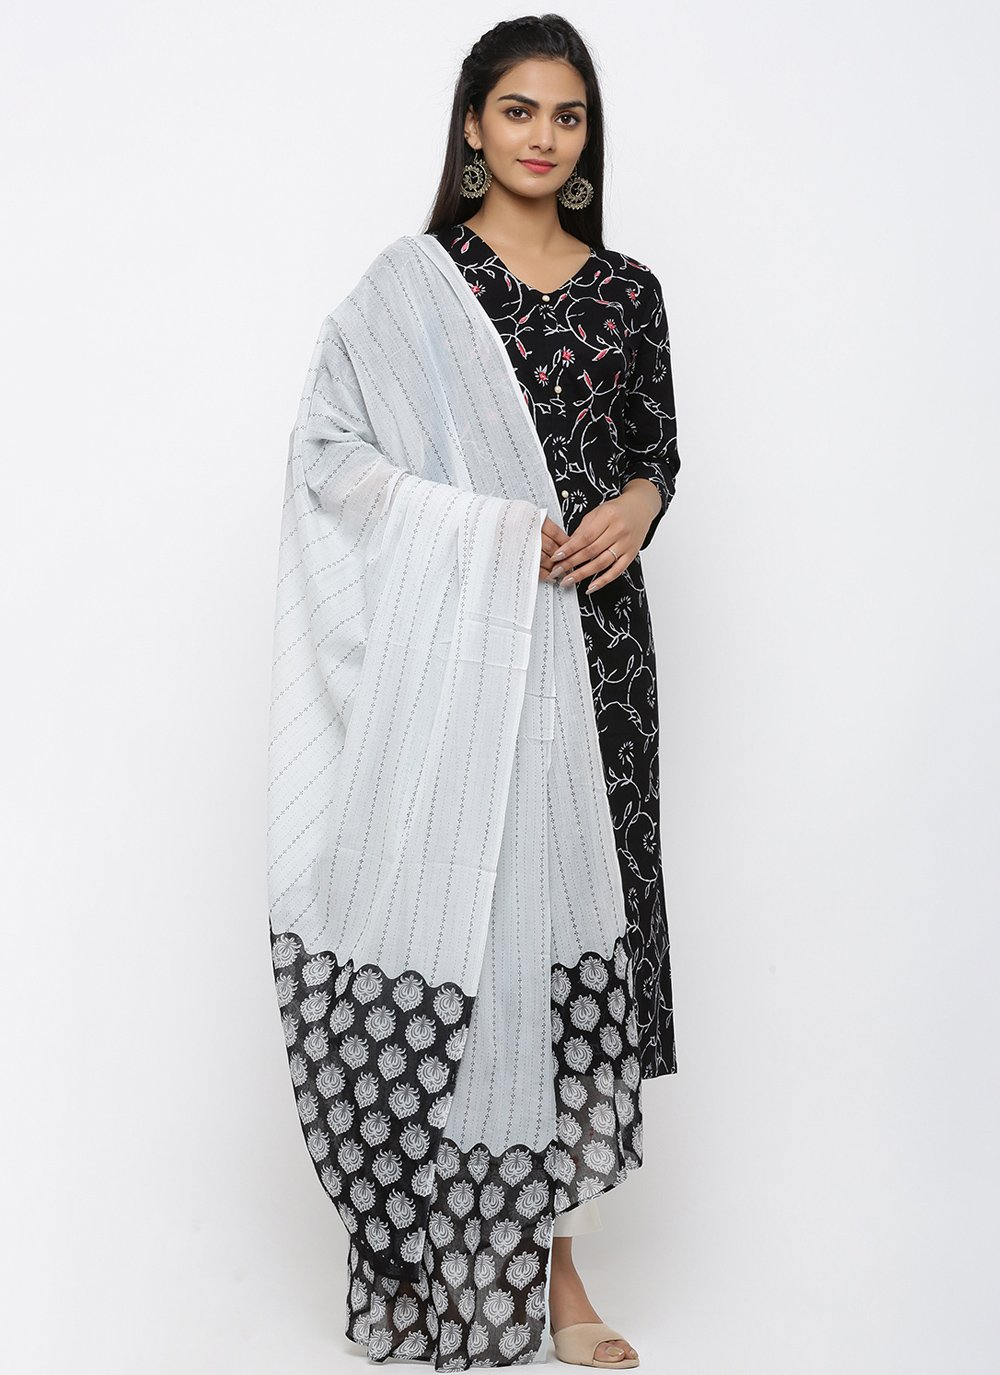 Cotton Print Black Salwar Kameez